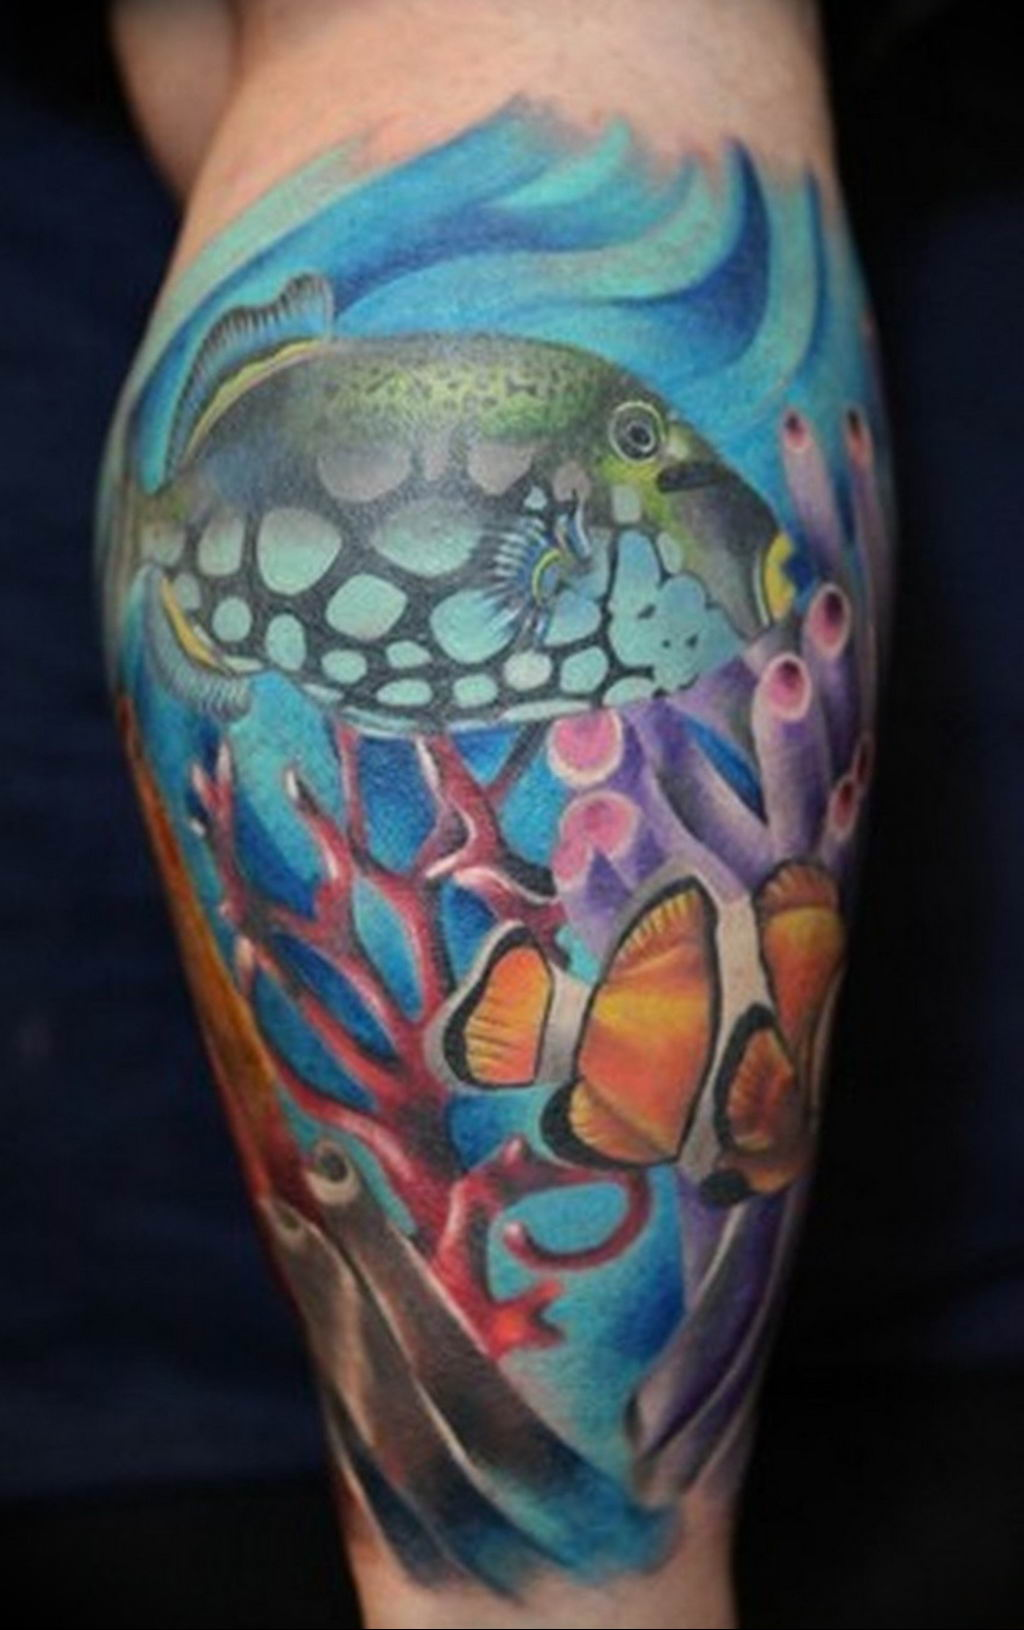 Фото тату океан 13.08.2019 №106 - ocean tattoo - tatufoto.com